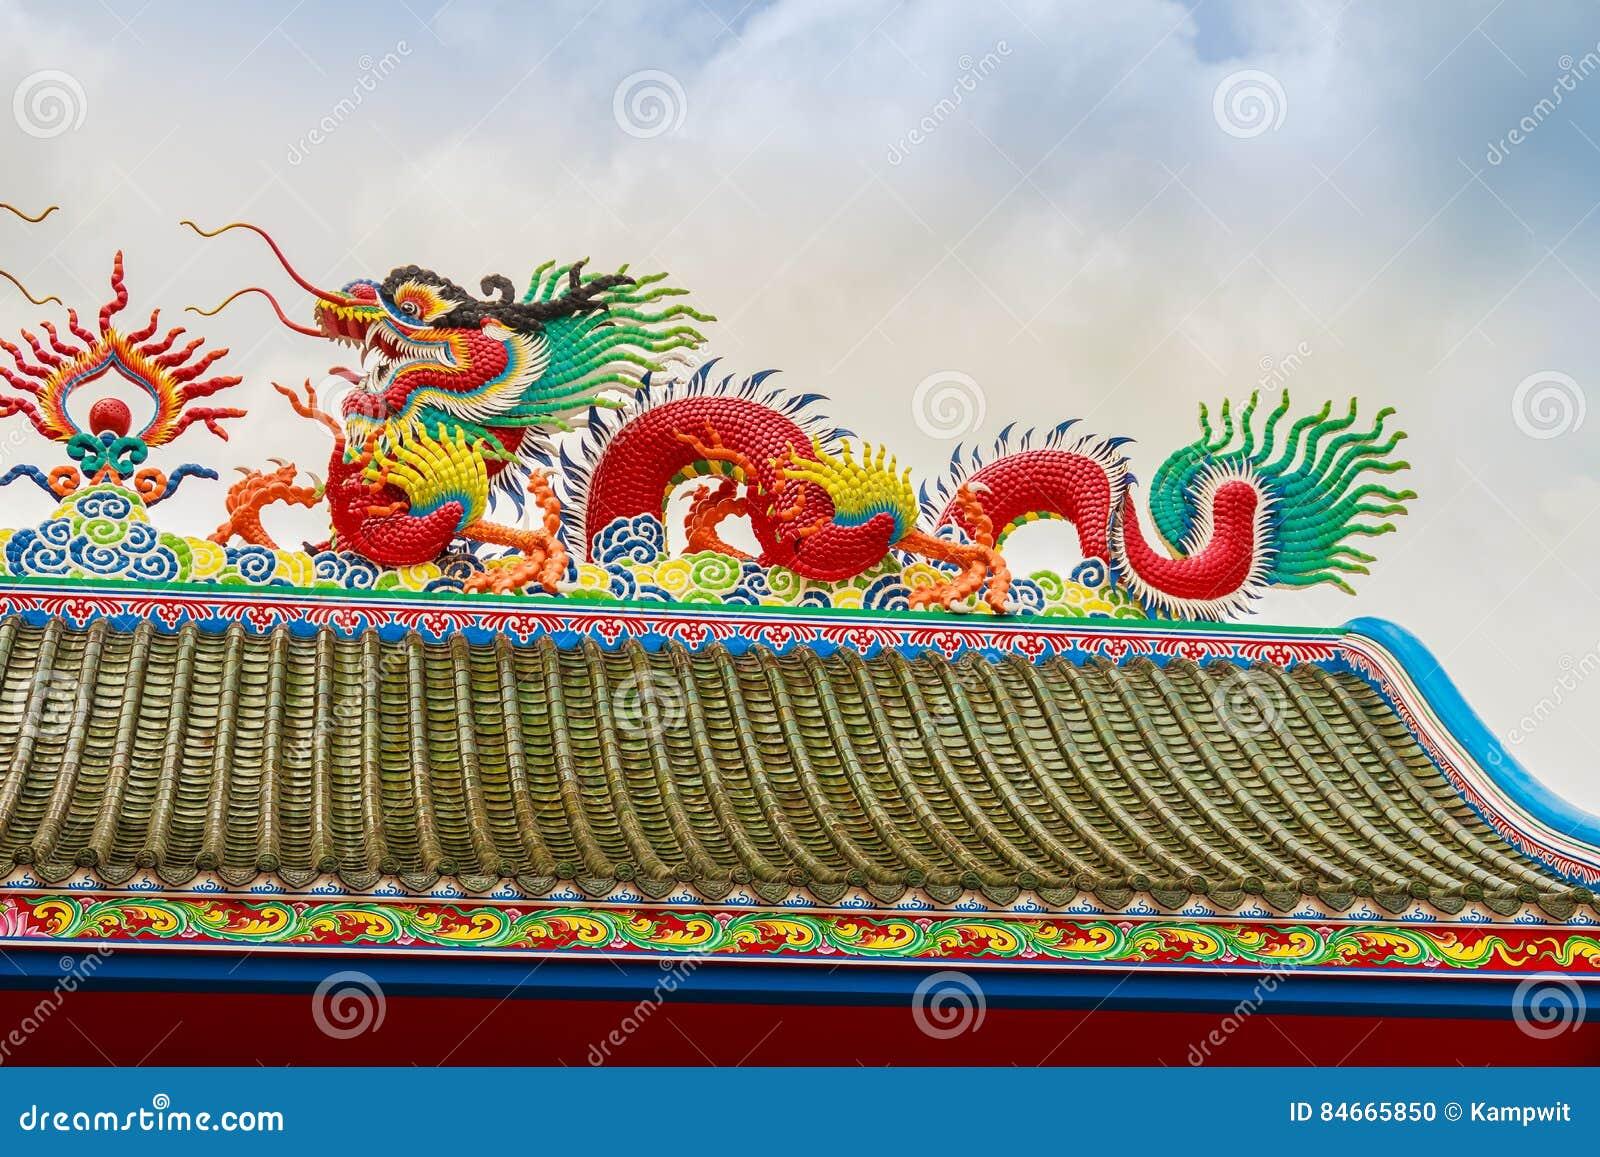 Beautiful Chinese dragons sculpture at Anek Kusala Sala Viharn Sien Chinese temple in Pattaya, Thailand. It was built in 1987 an